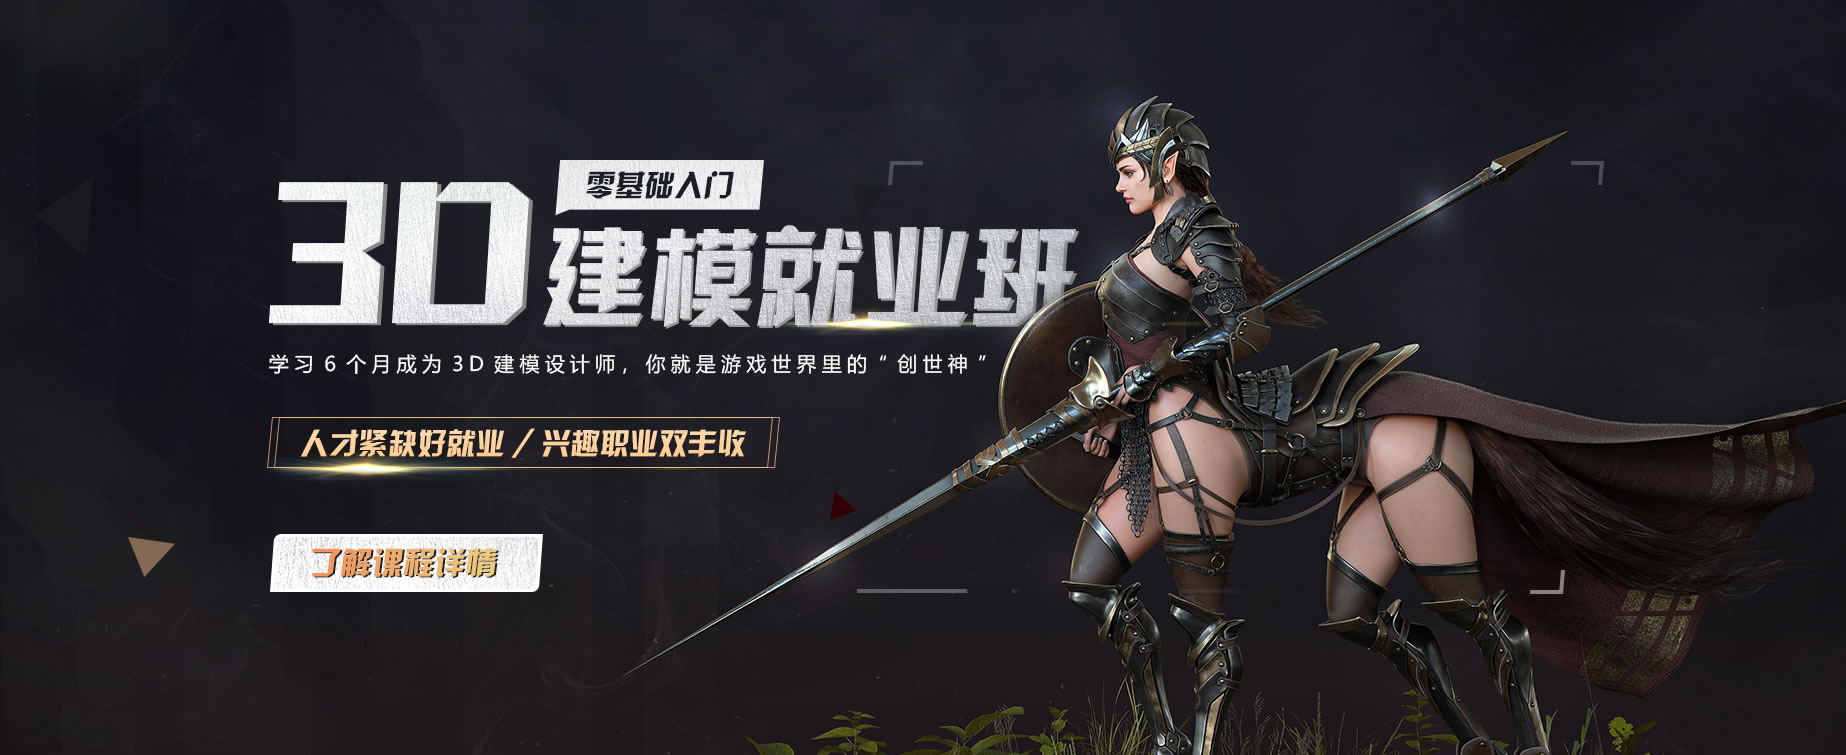 第九联盟3D建模课banner